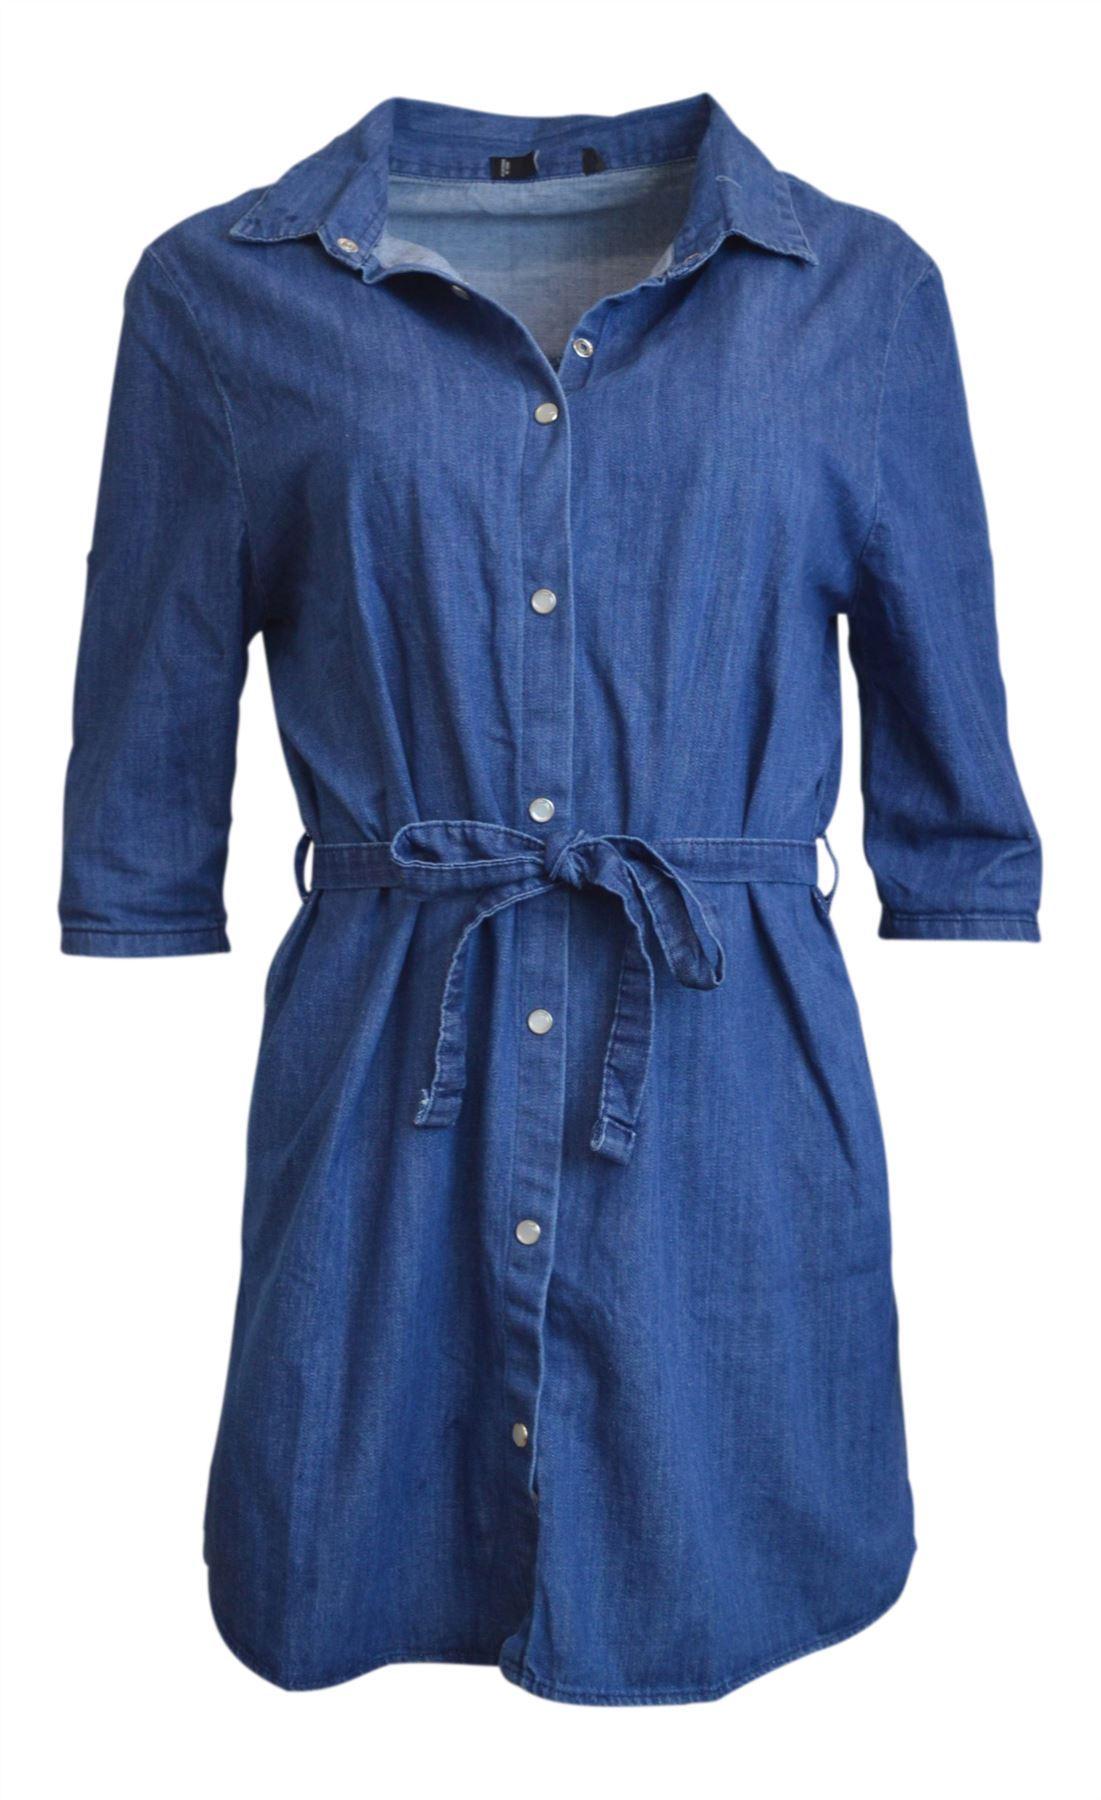 26f325fa11e Details about Ex Mango Womens Blue Denim Shirt Dress Tie Waist Tall Long  Top Size M L